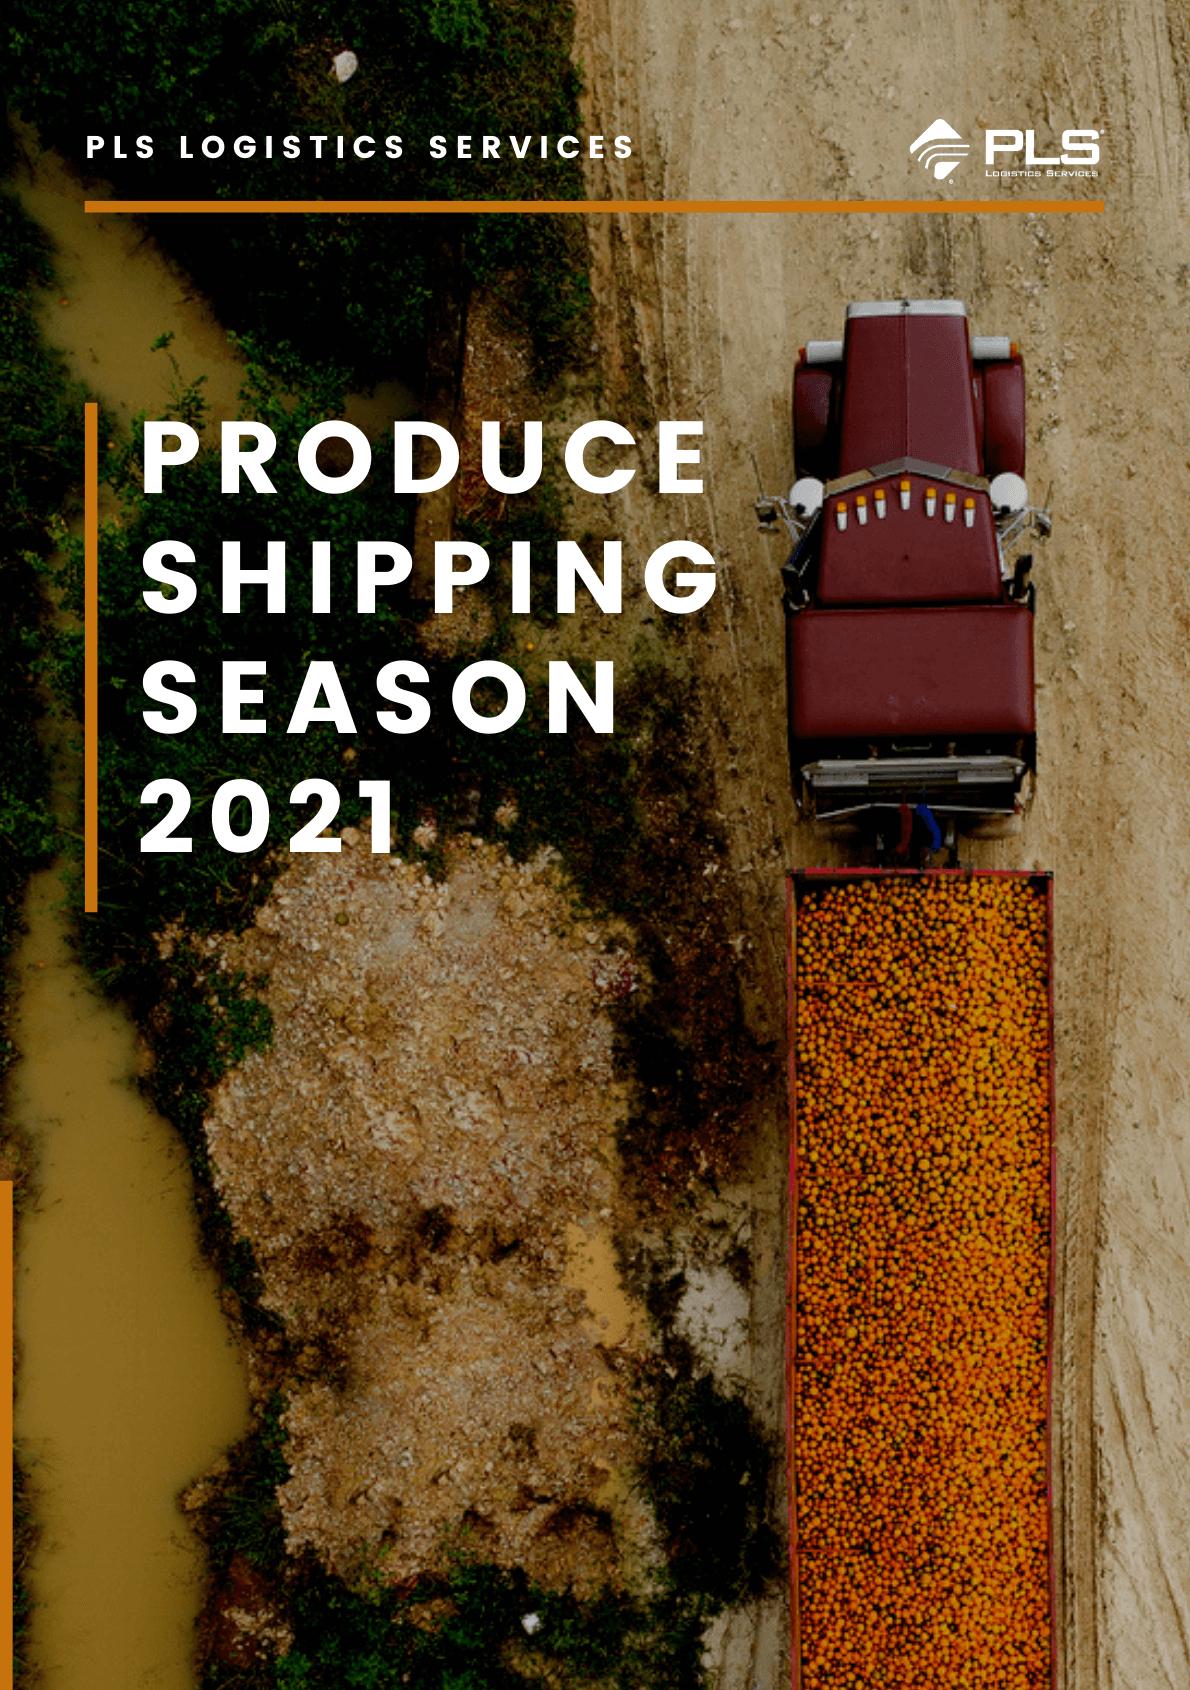 ProduceShipping Season2021